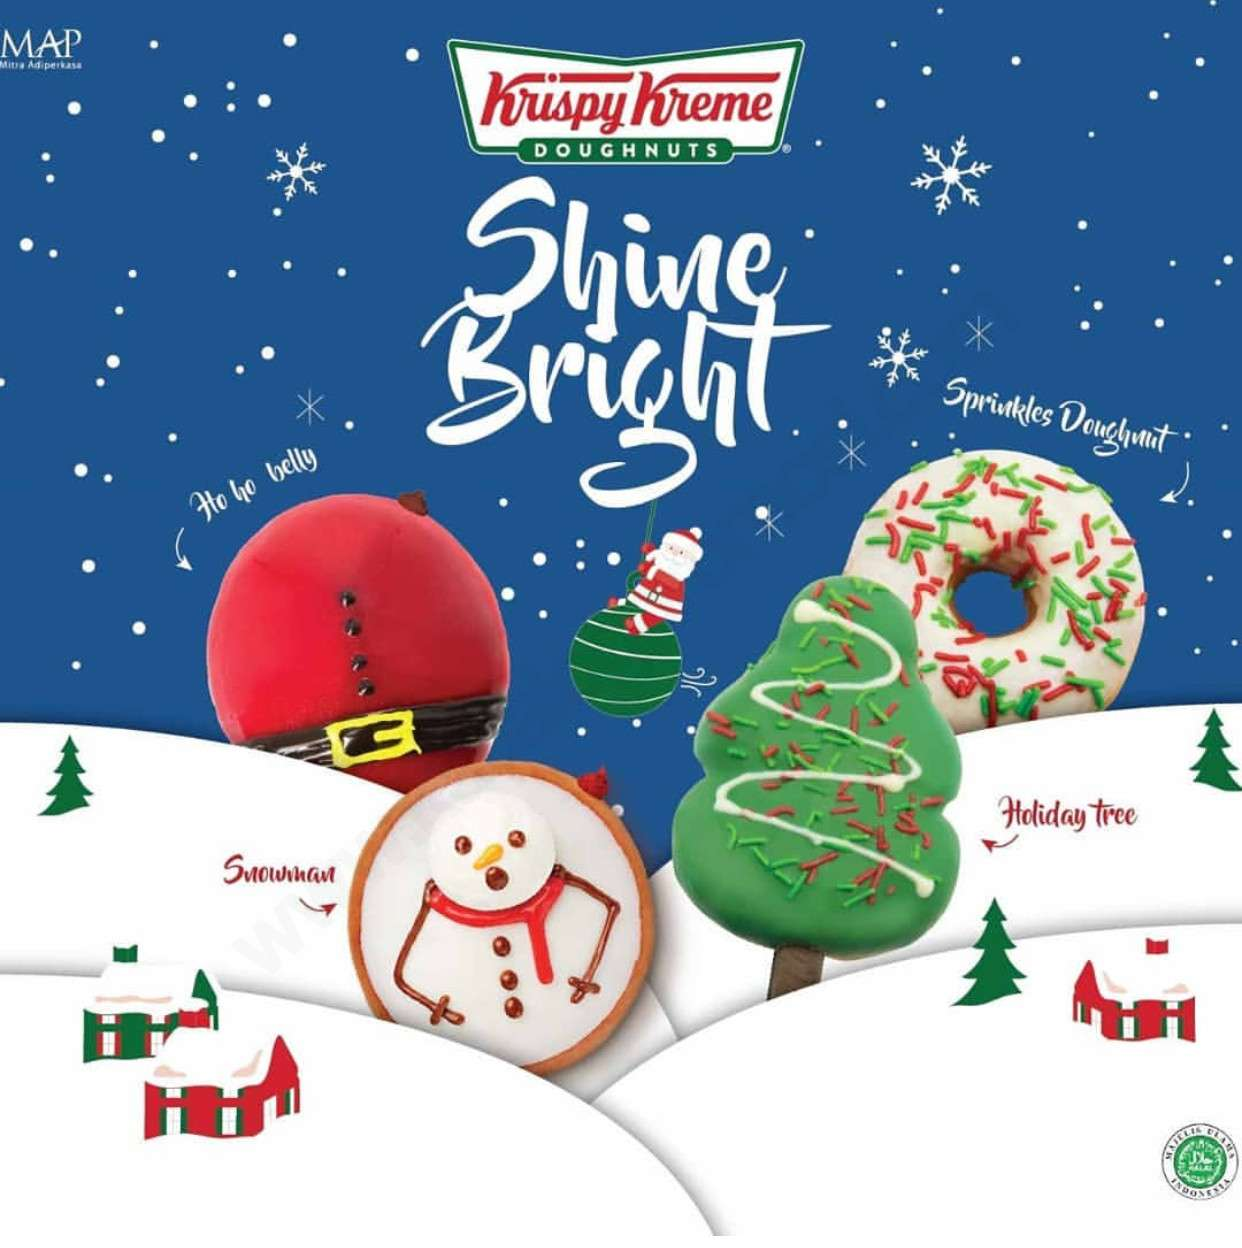 Krispy Kreme Special Holiday Edition Doughnuts